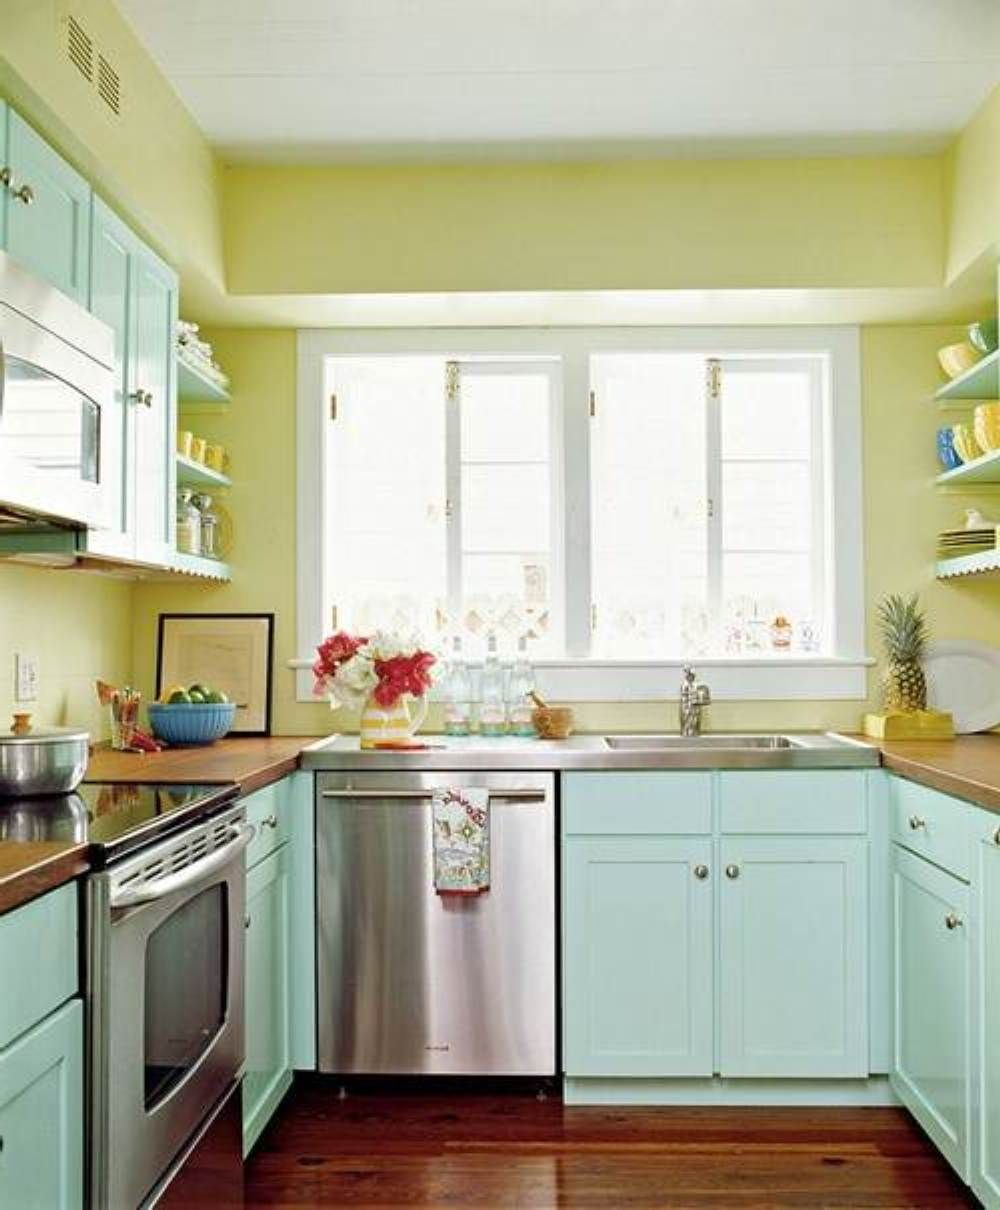 Small Kitchen Design Ideas | Home Decor | Pinterest ...